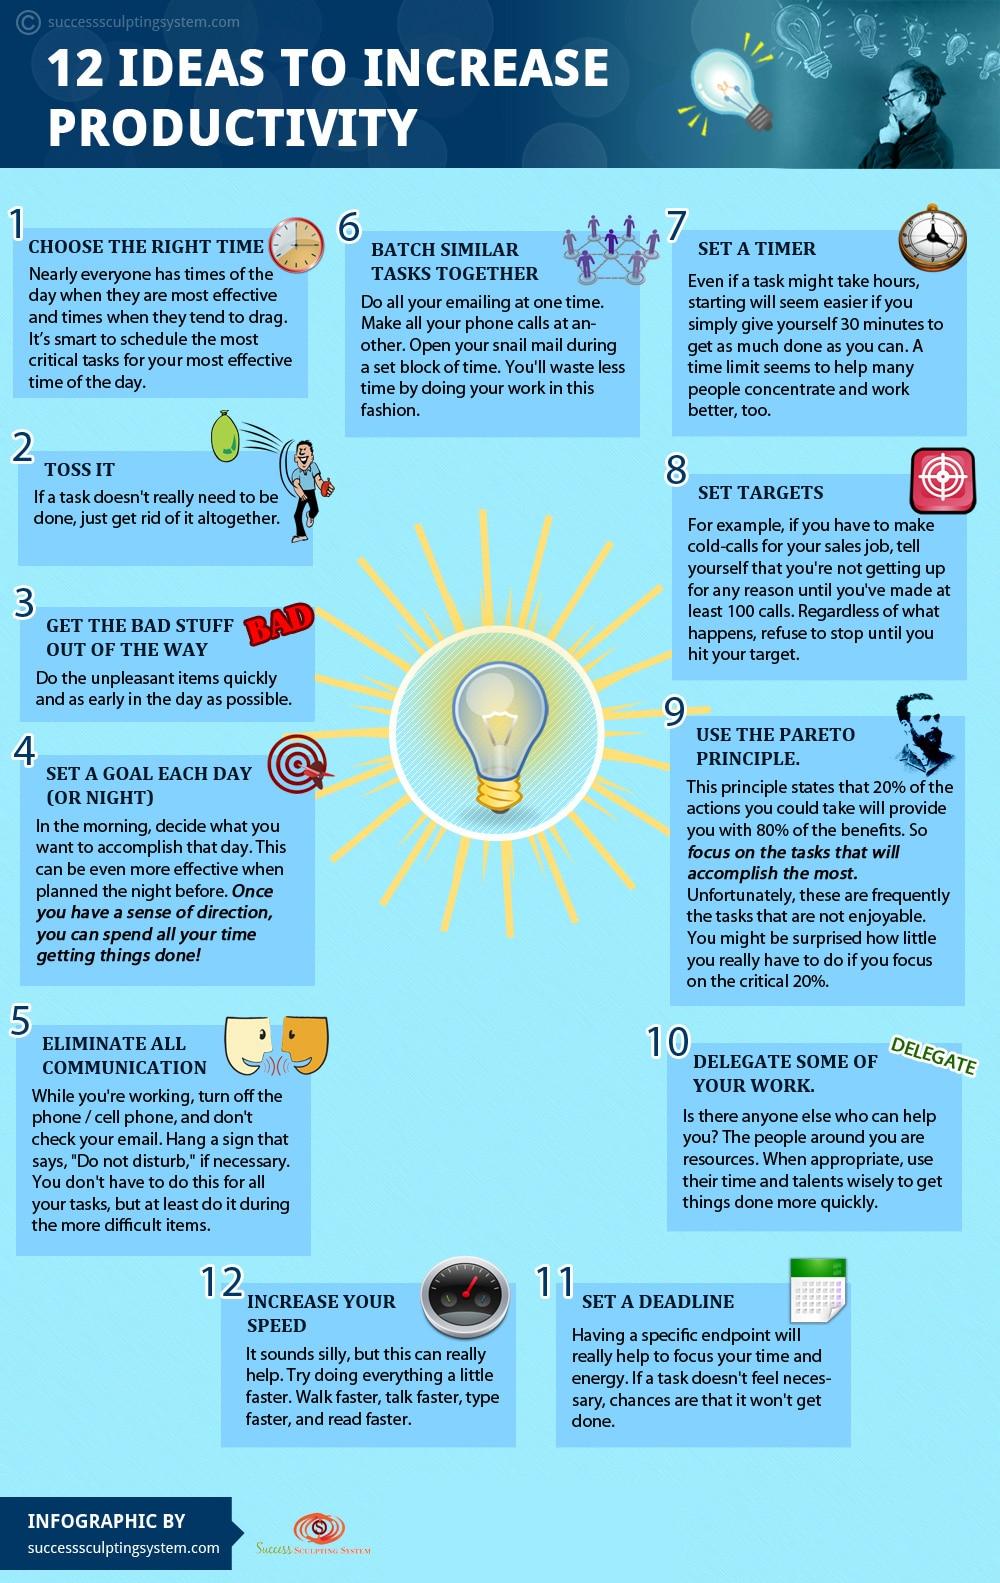 https://bitrebels.com/wp-content/uploads/2013/05/increase-productivity-10-tips-infographic.jpg